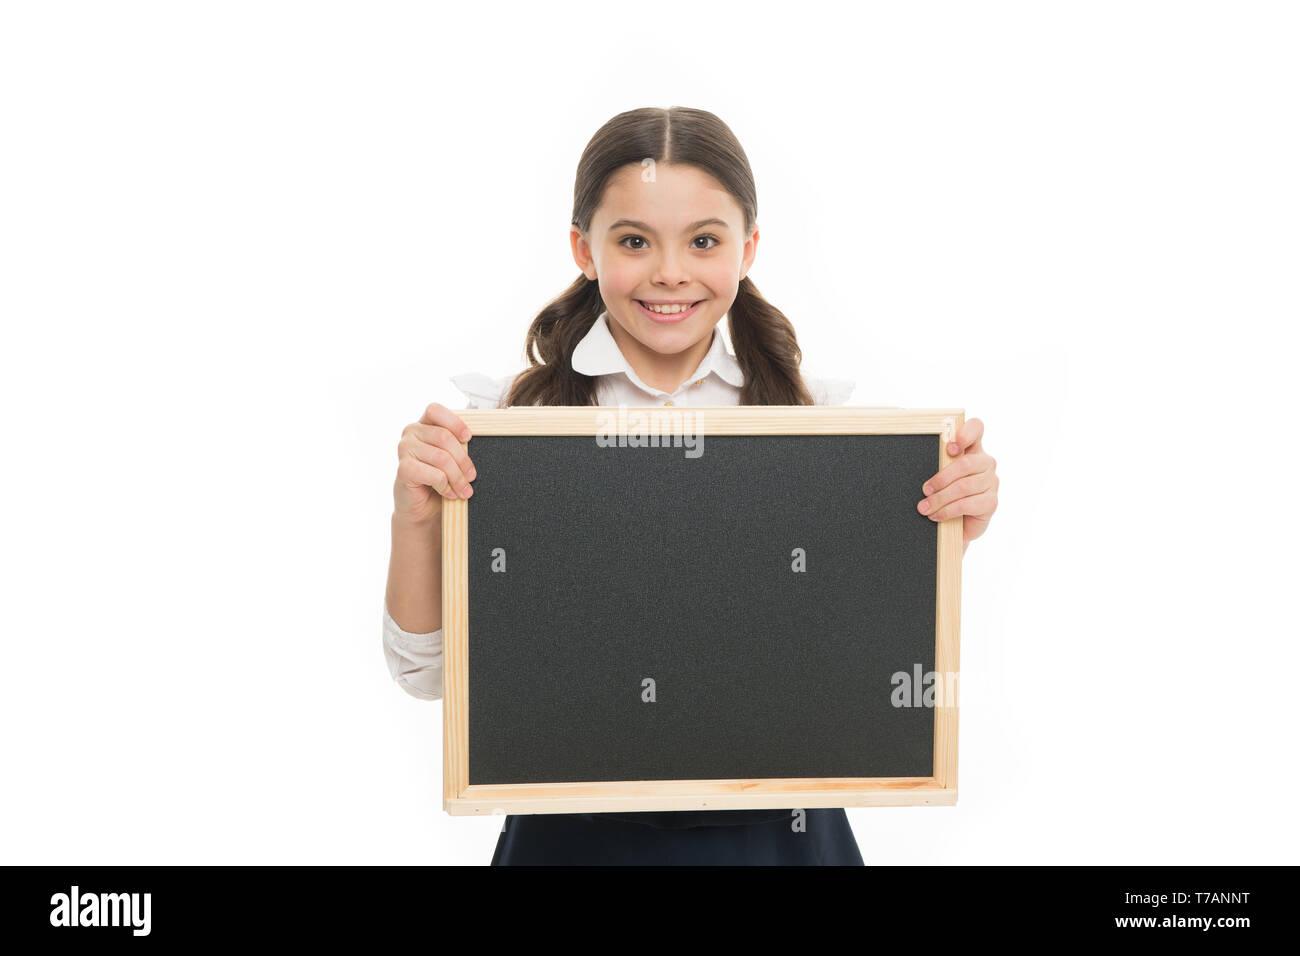 Perfect schoolgirl. Happy girl wear school uniform. Back to school concept. Schoolgirl smiling pupil long hair. Diligent schoolgirl hold blank chalkboard copy space. Announcement and advertisement. - Stock Image